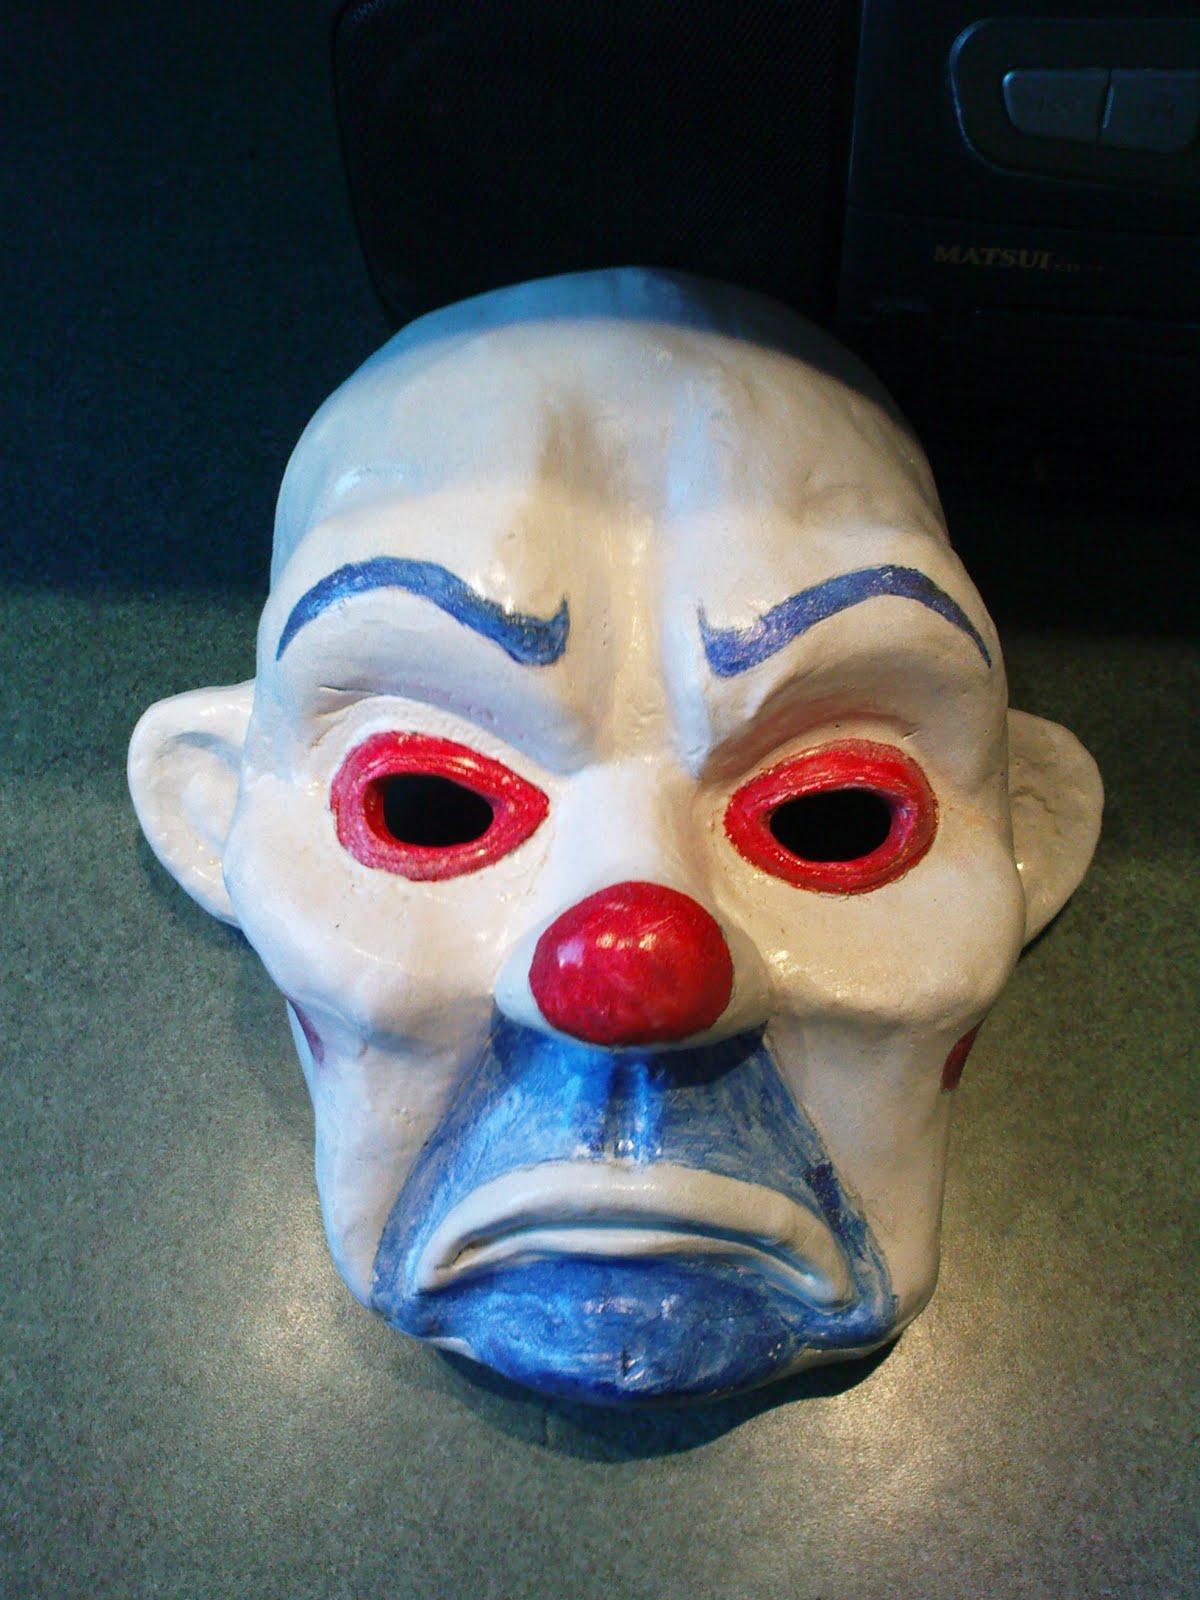 J Darko Joker Bank Heist Mask